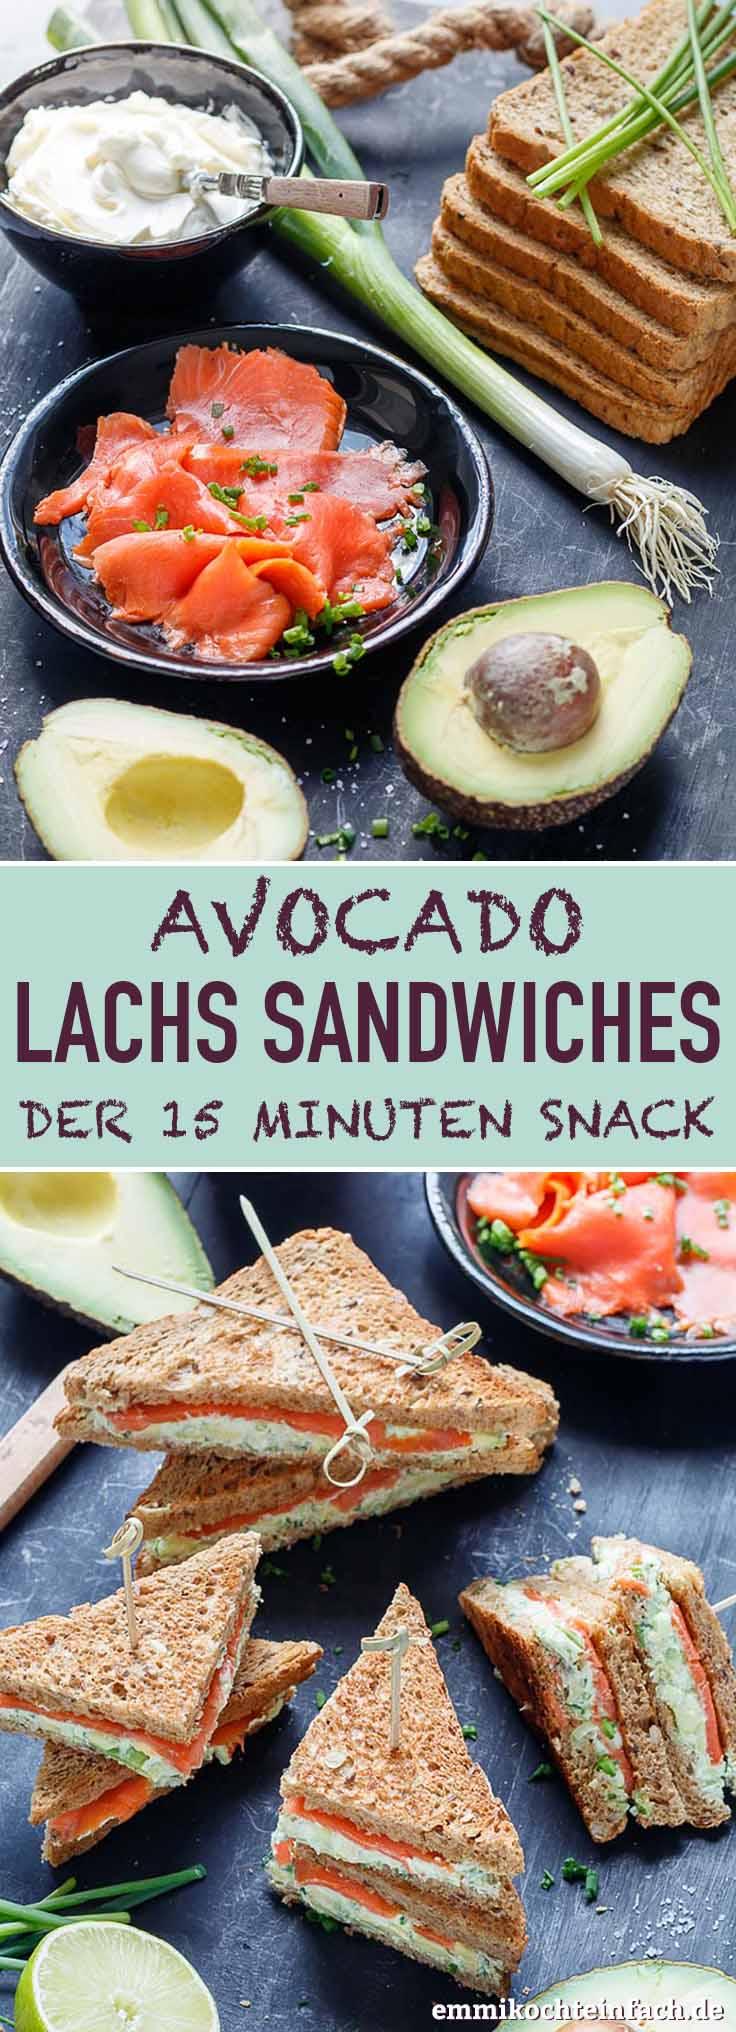 Avocado Lachs Sandwiches - www.emmikochteinfach.de